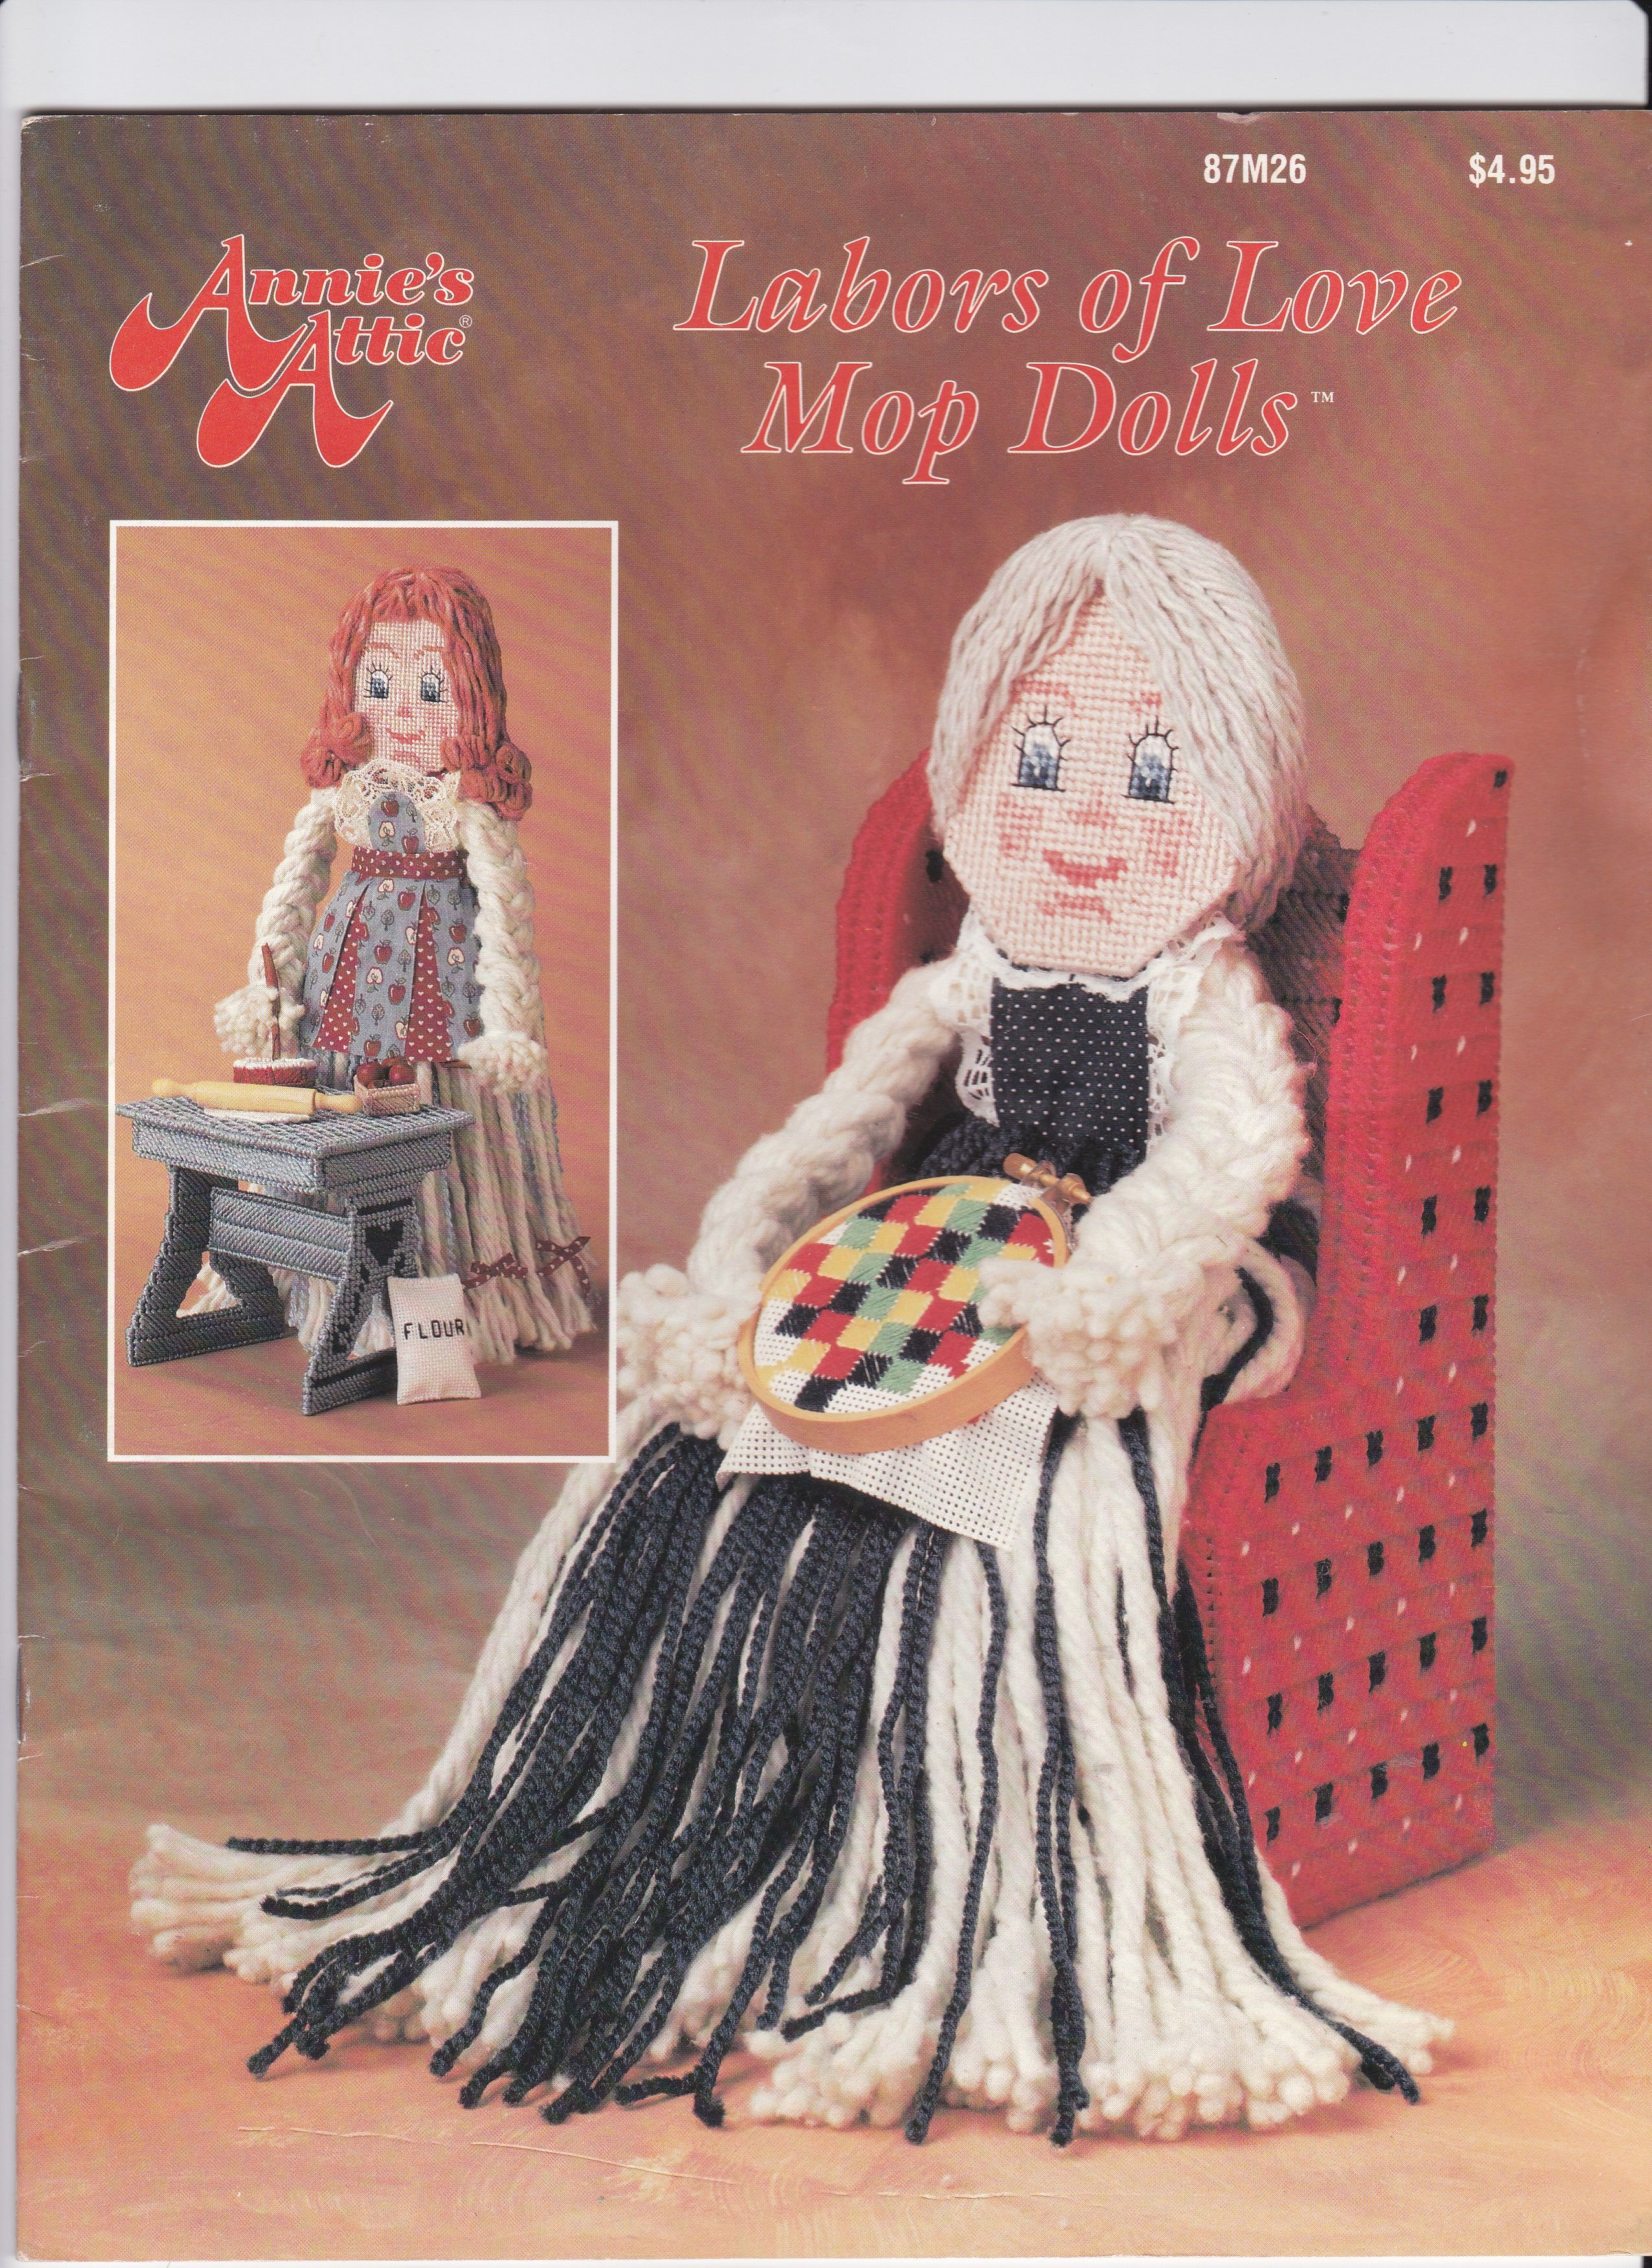 labors of love mop dolls FC | Plastic Canvas Dolls | Pinterest